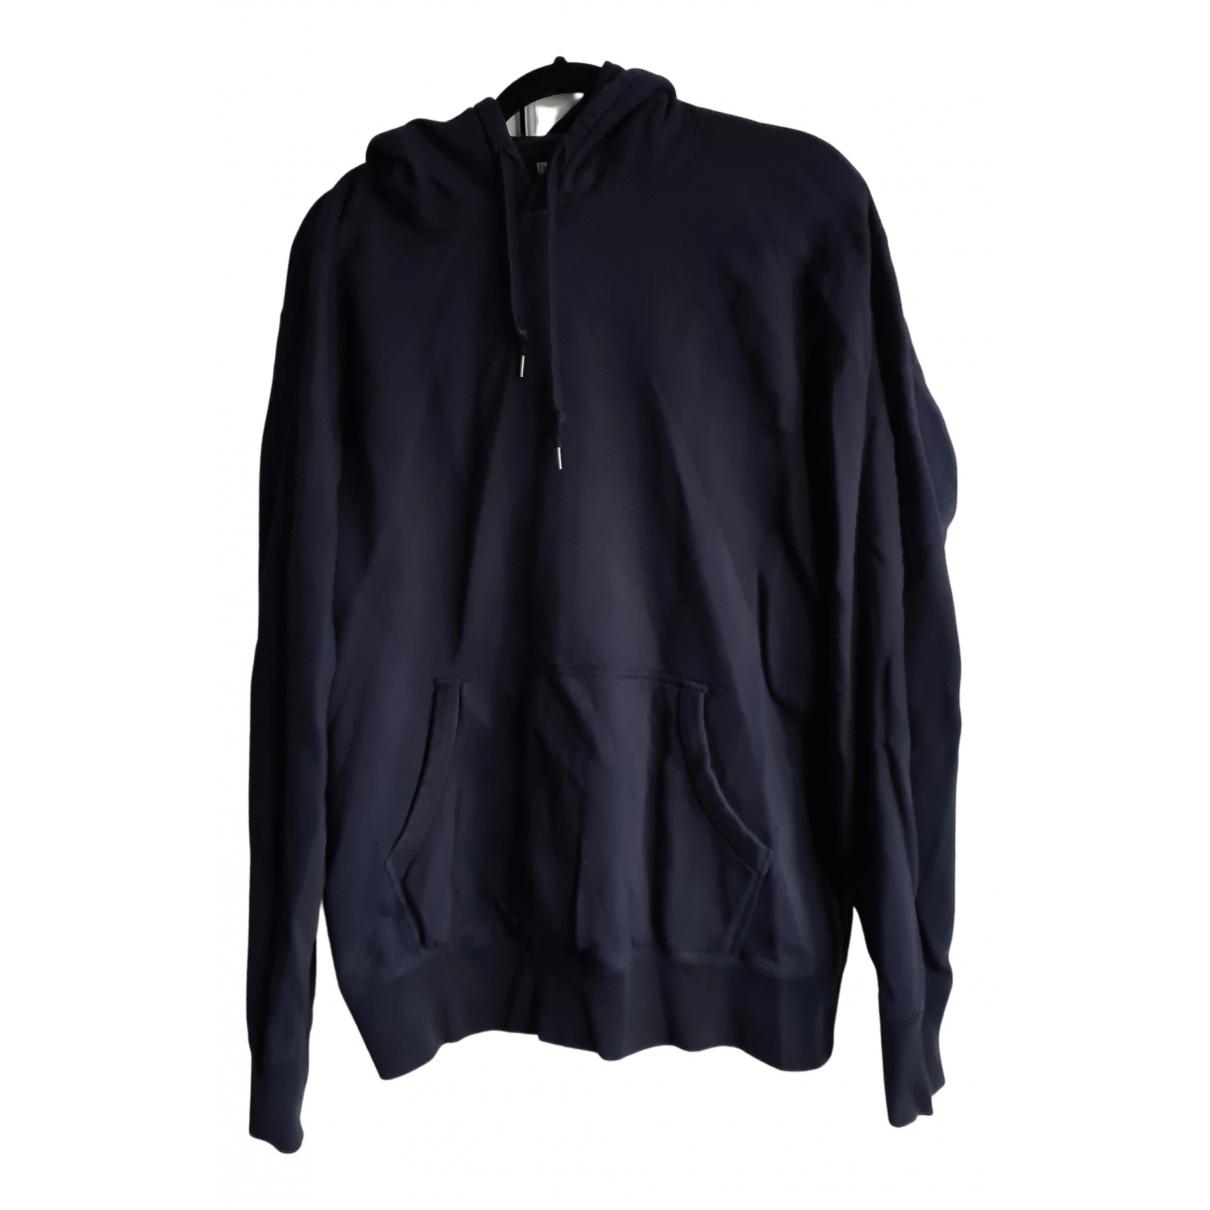 Uniqlo N Navy Cotton Knitwear & Sweatshirts for Men L International